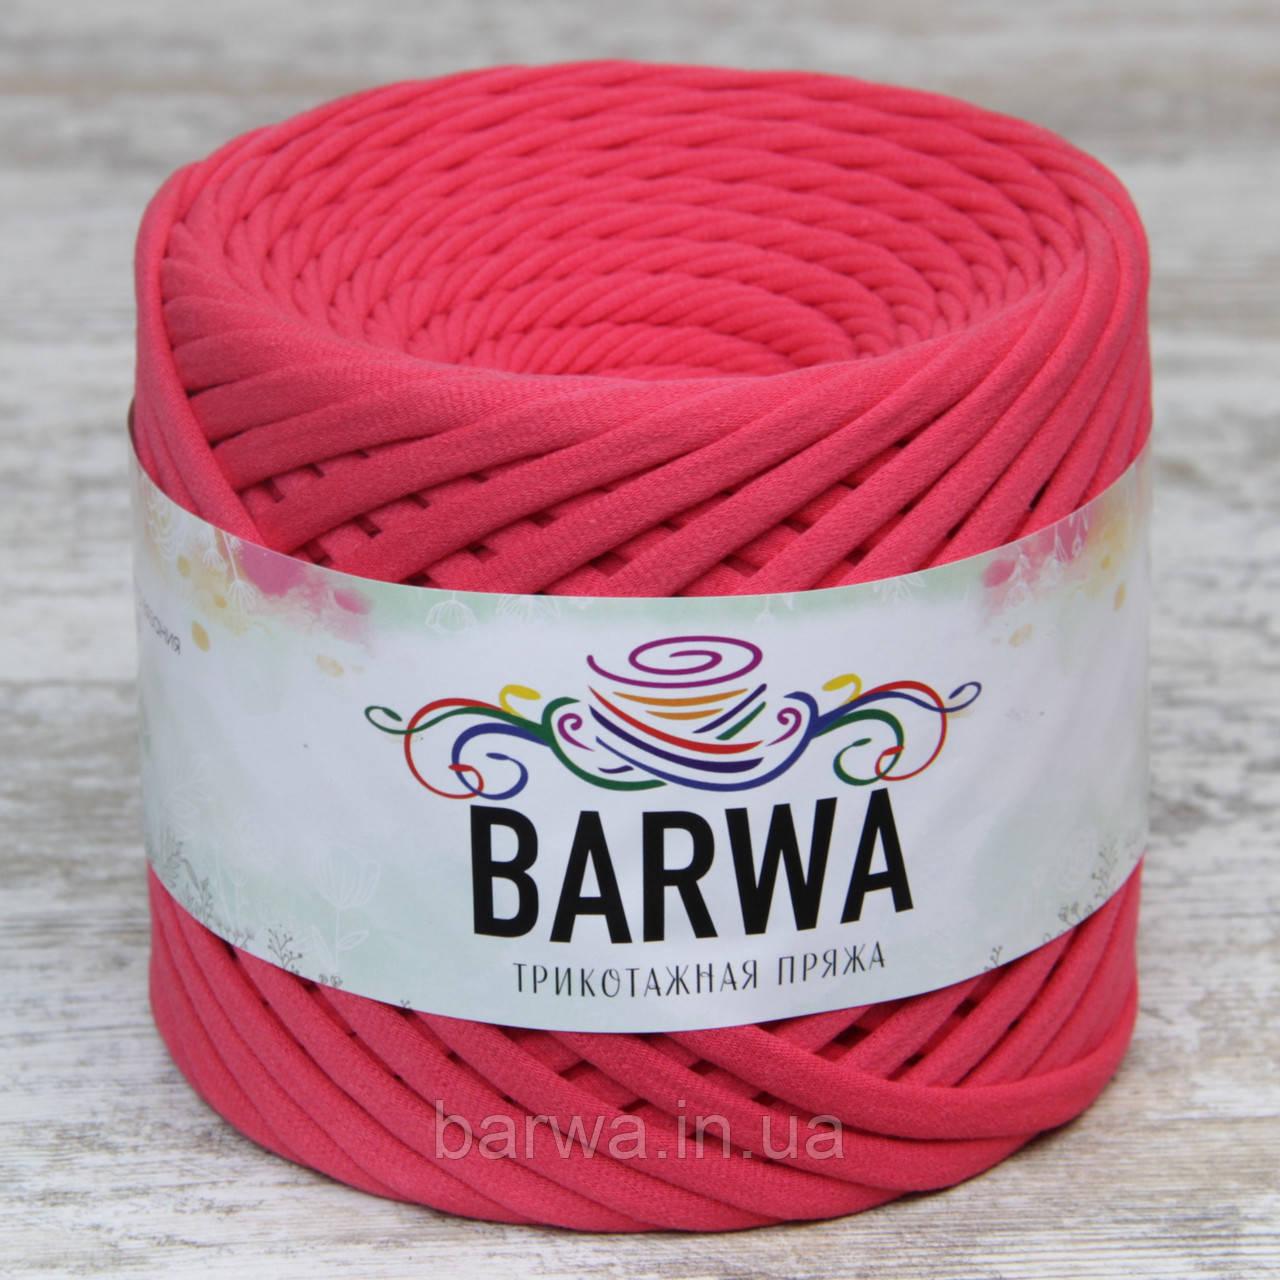 Трикотажная пряжа BARWA standart 7-9 мм, цвет Живой коралл